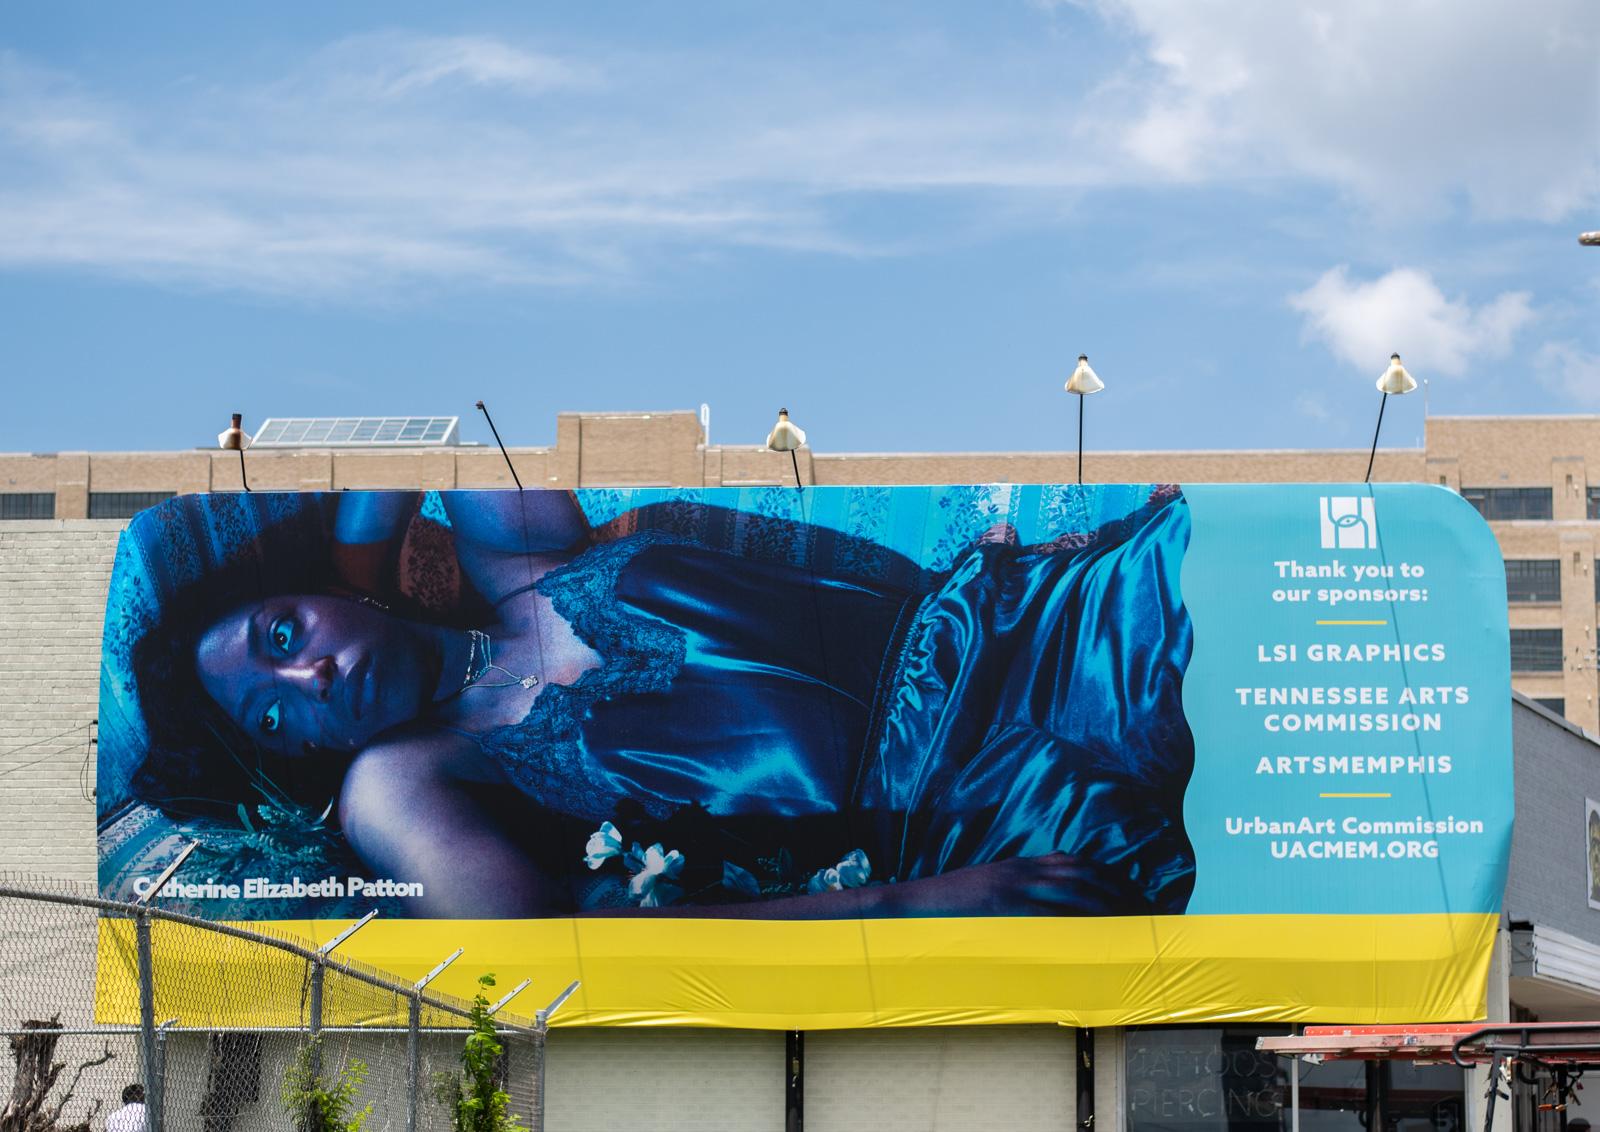 pictured: UAC Billboard, Ebony Archie